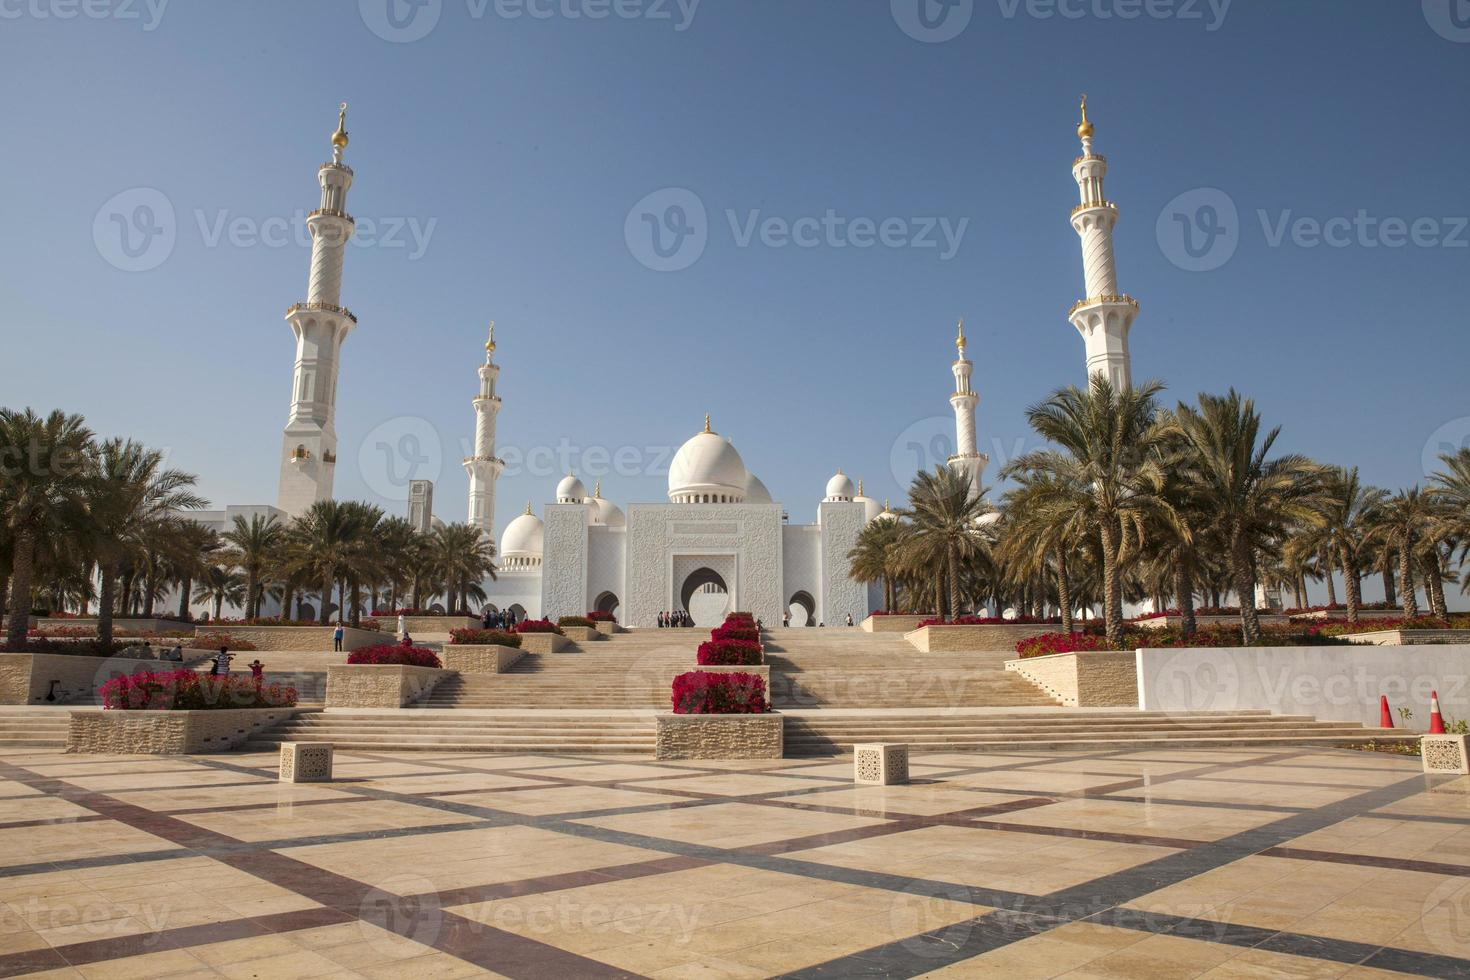 Sheikh Zayed Mosque, Abu Dhabi, UAE photo